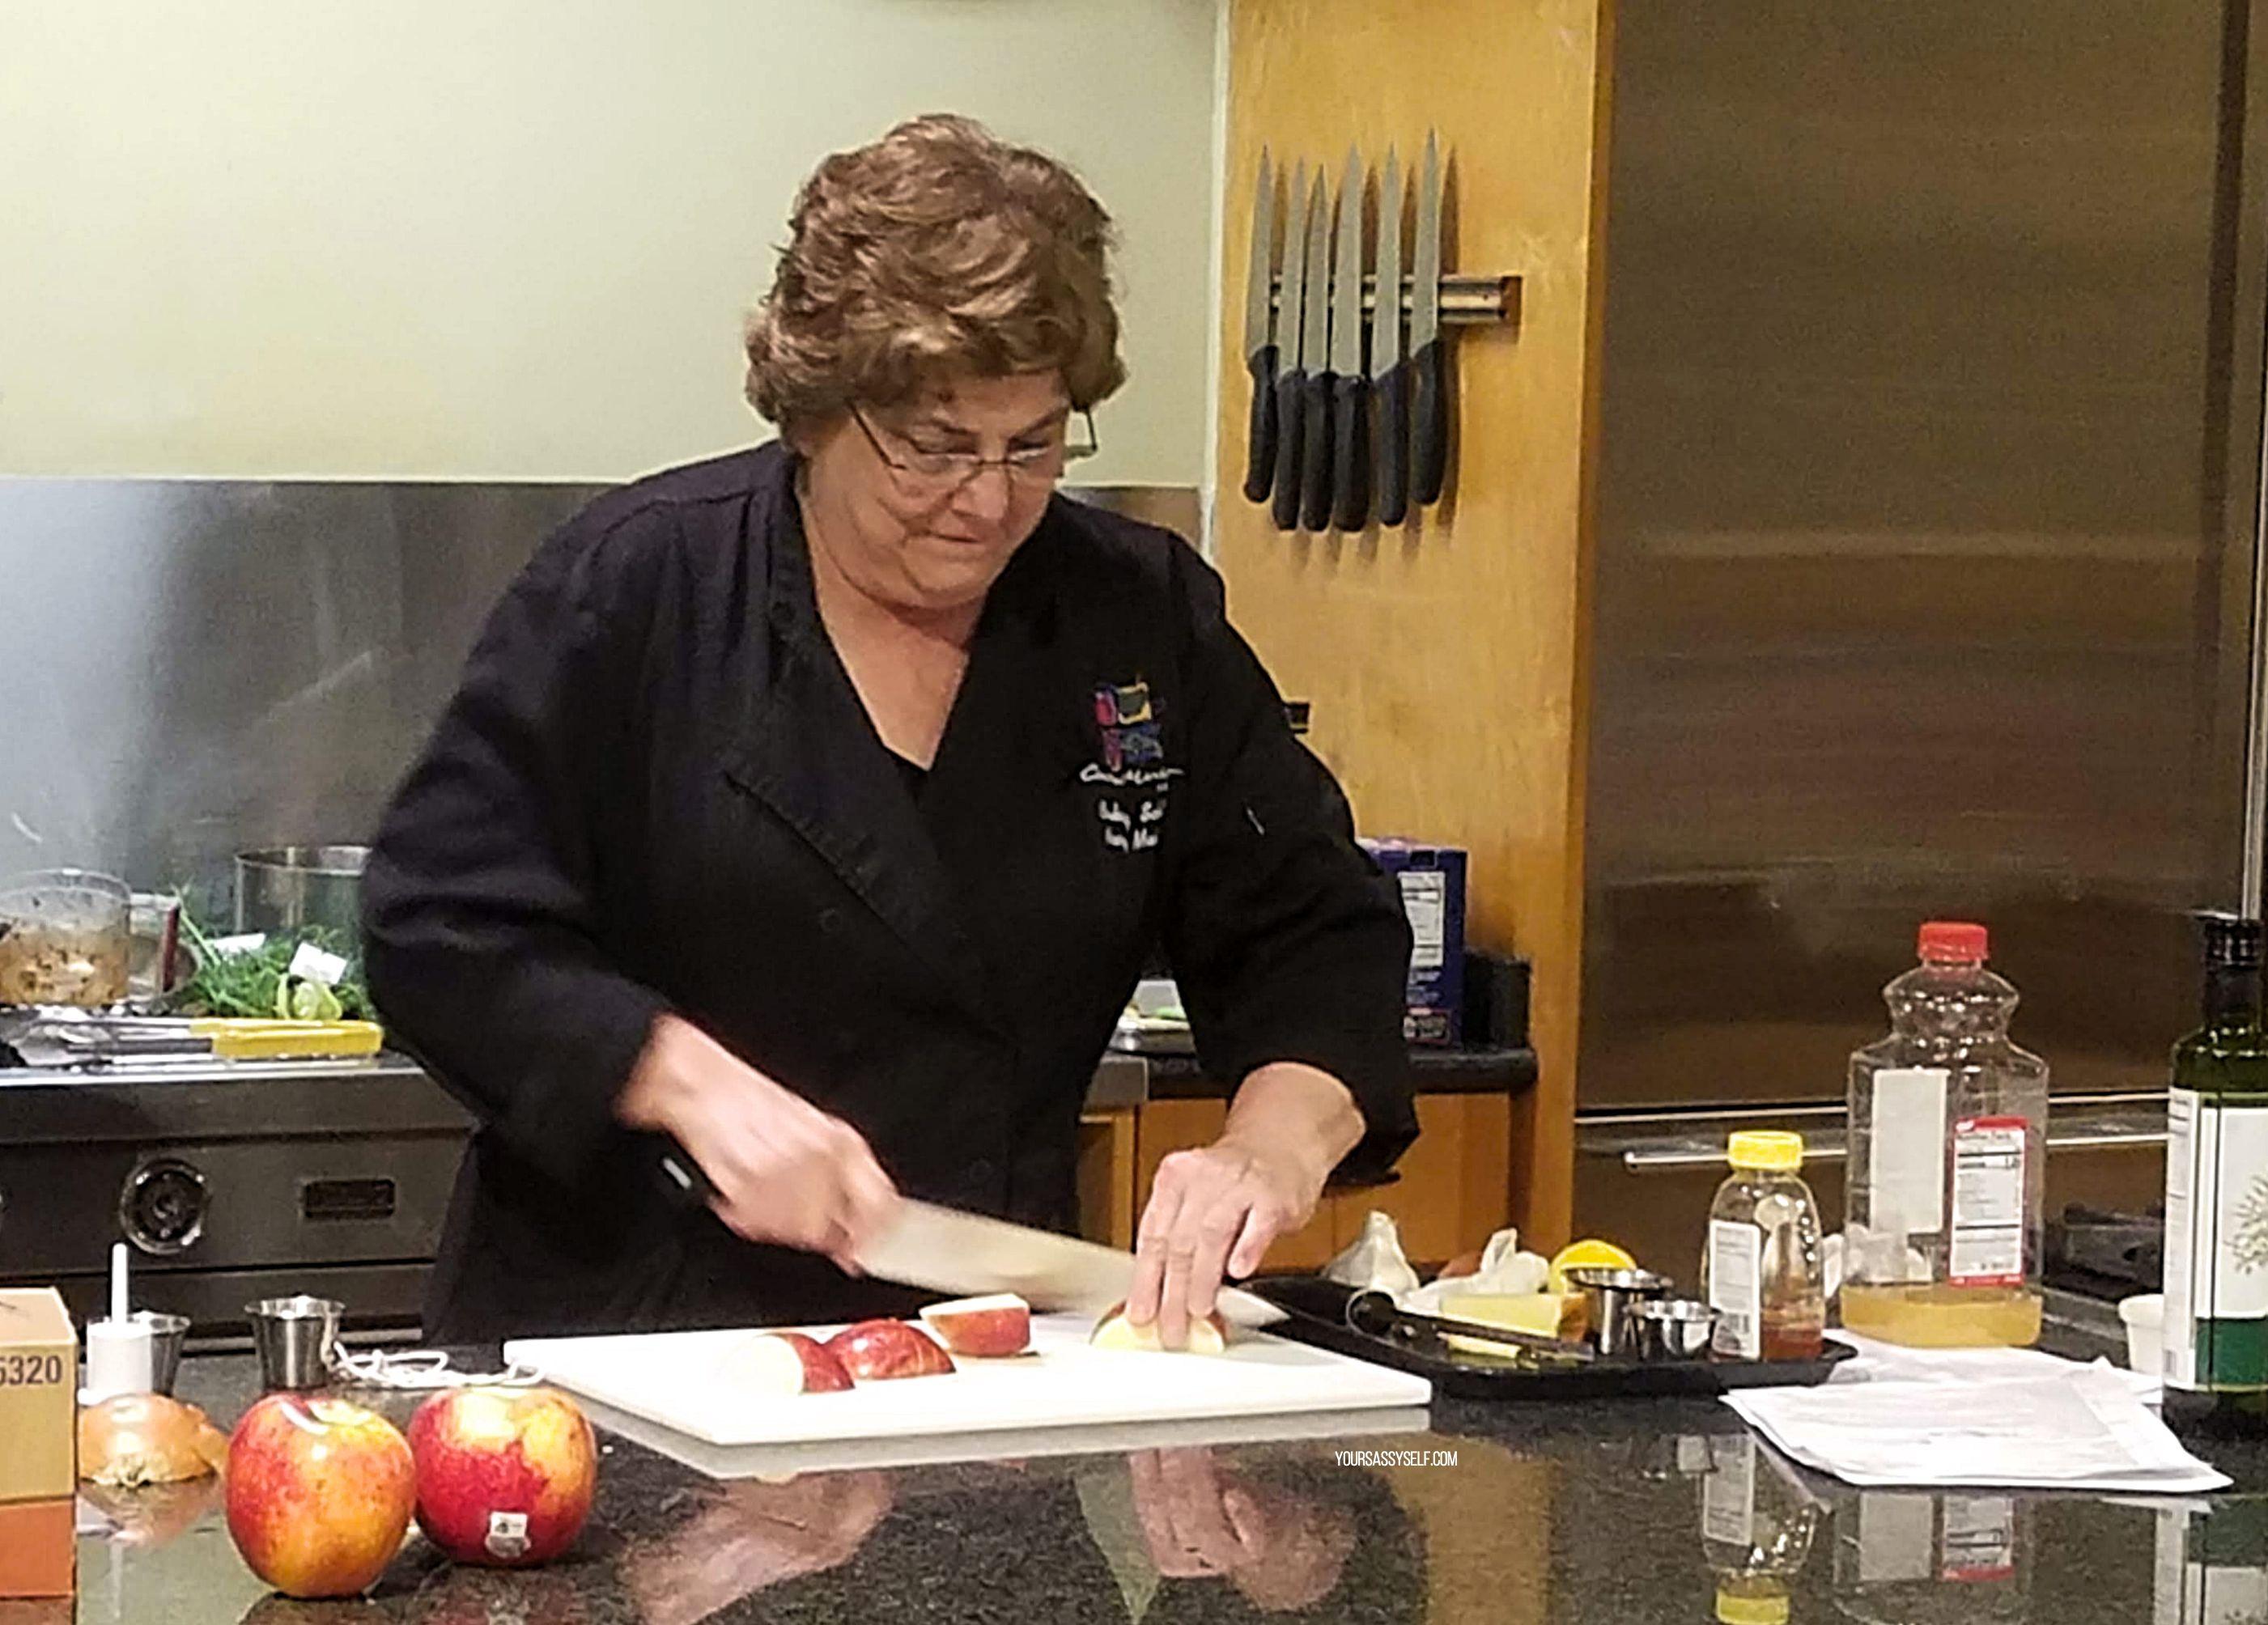 Chef cutting apple on cutting board - yoursassyself.com